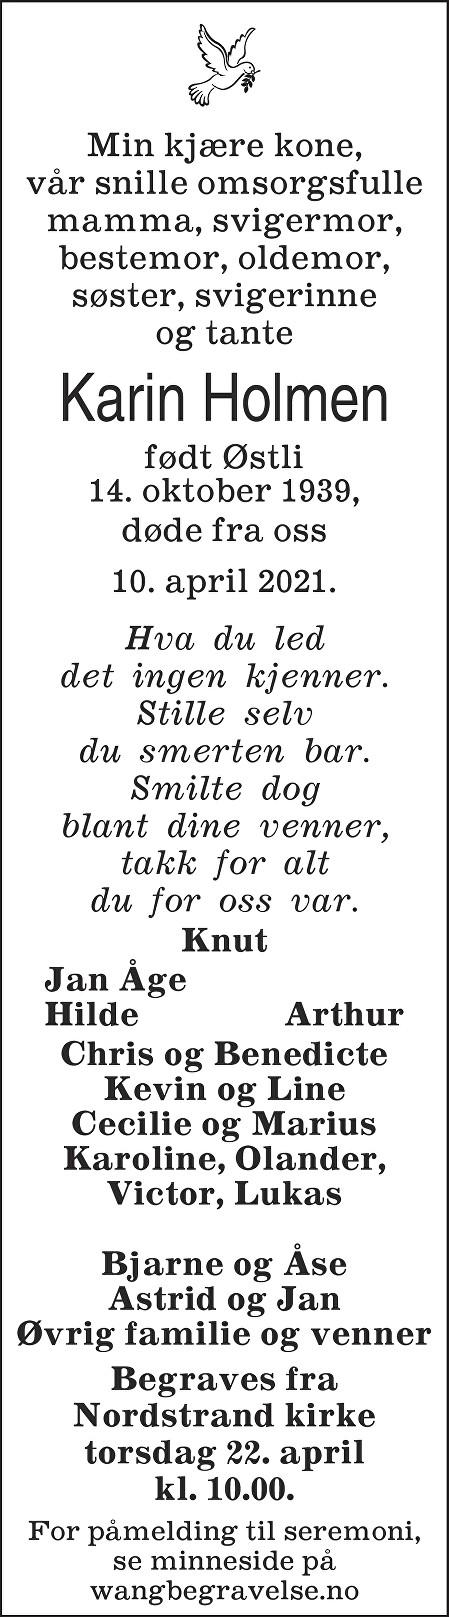 Karin Holmen Dødsannonse